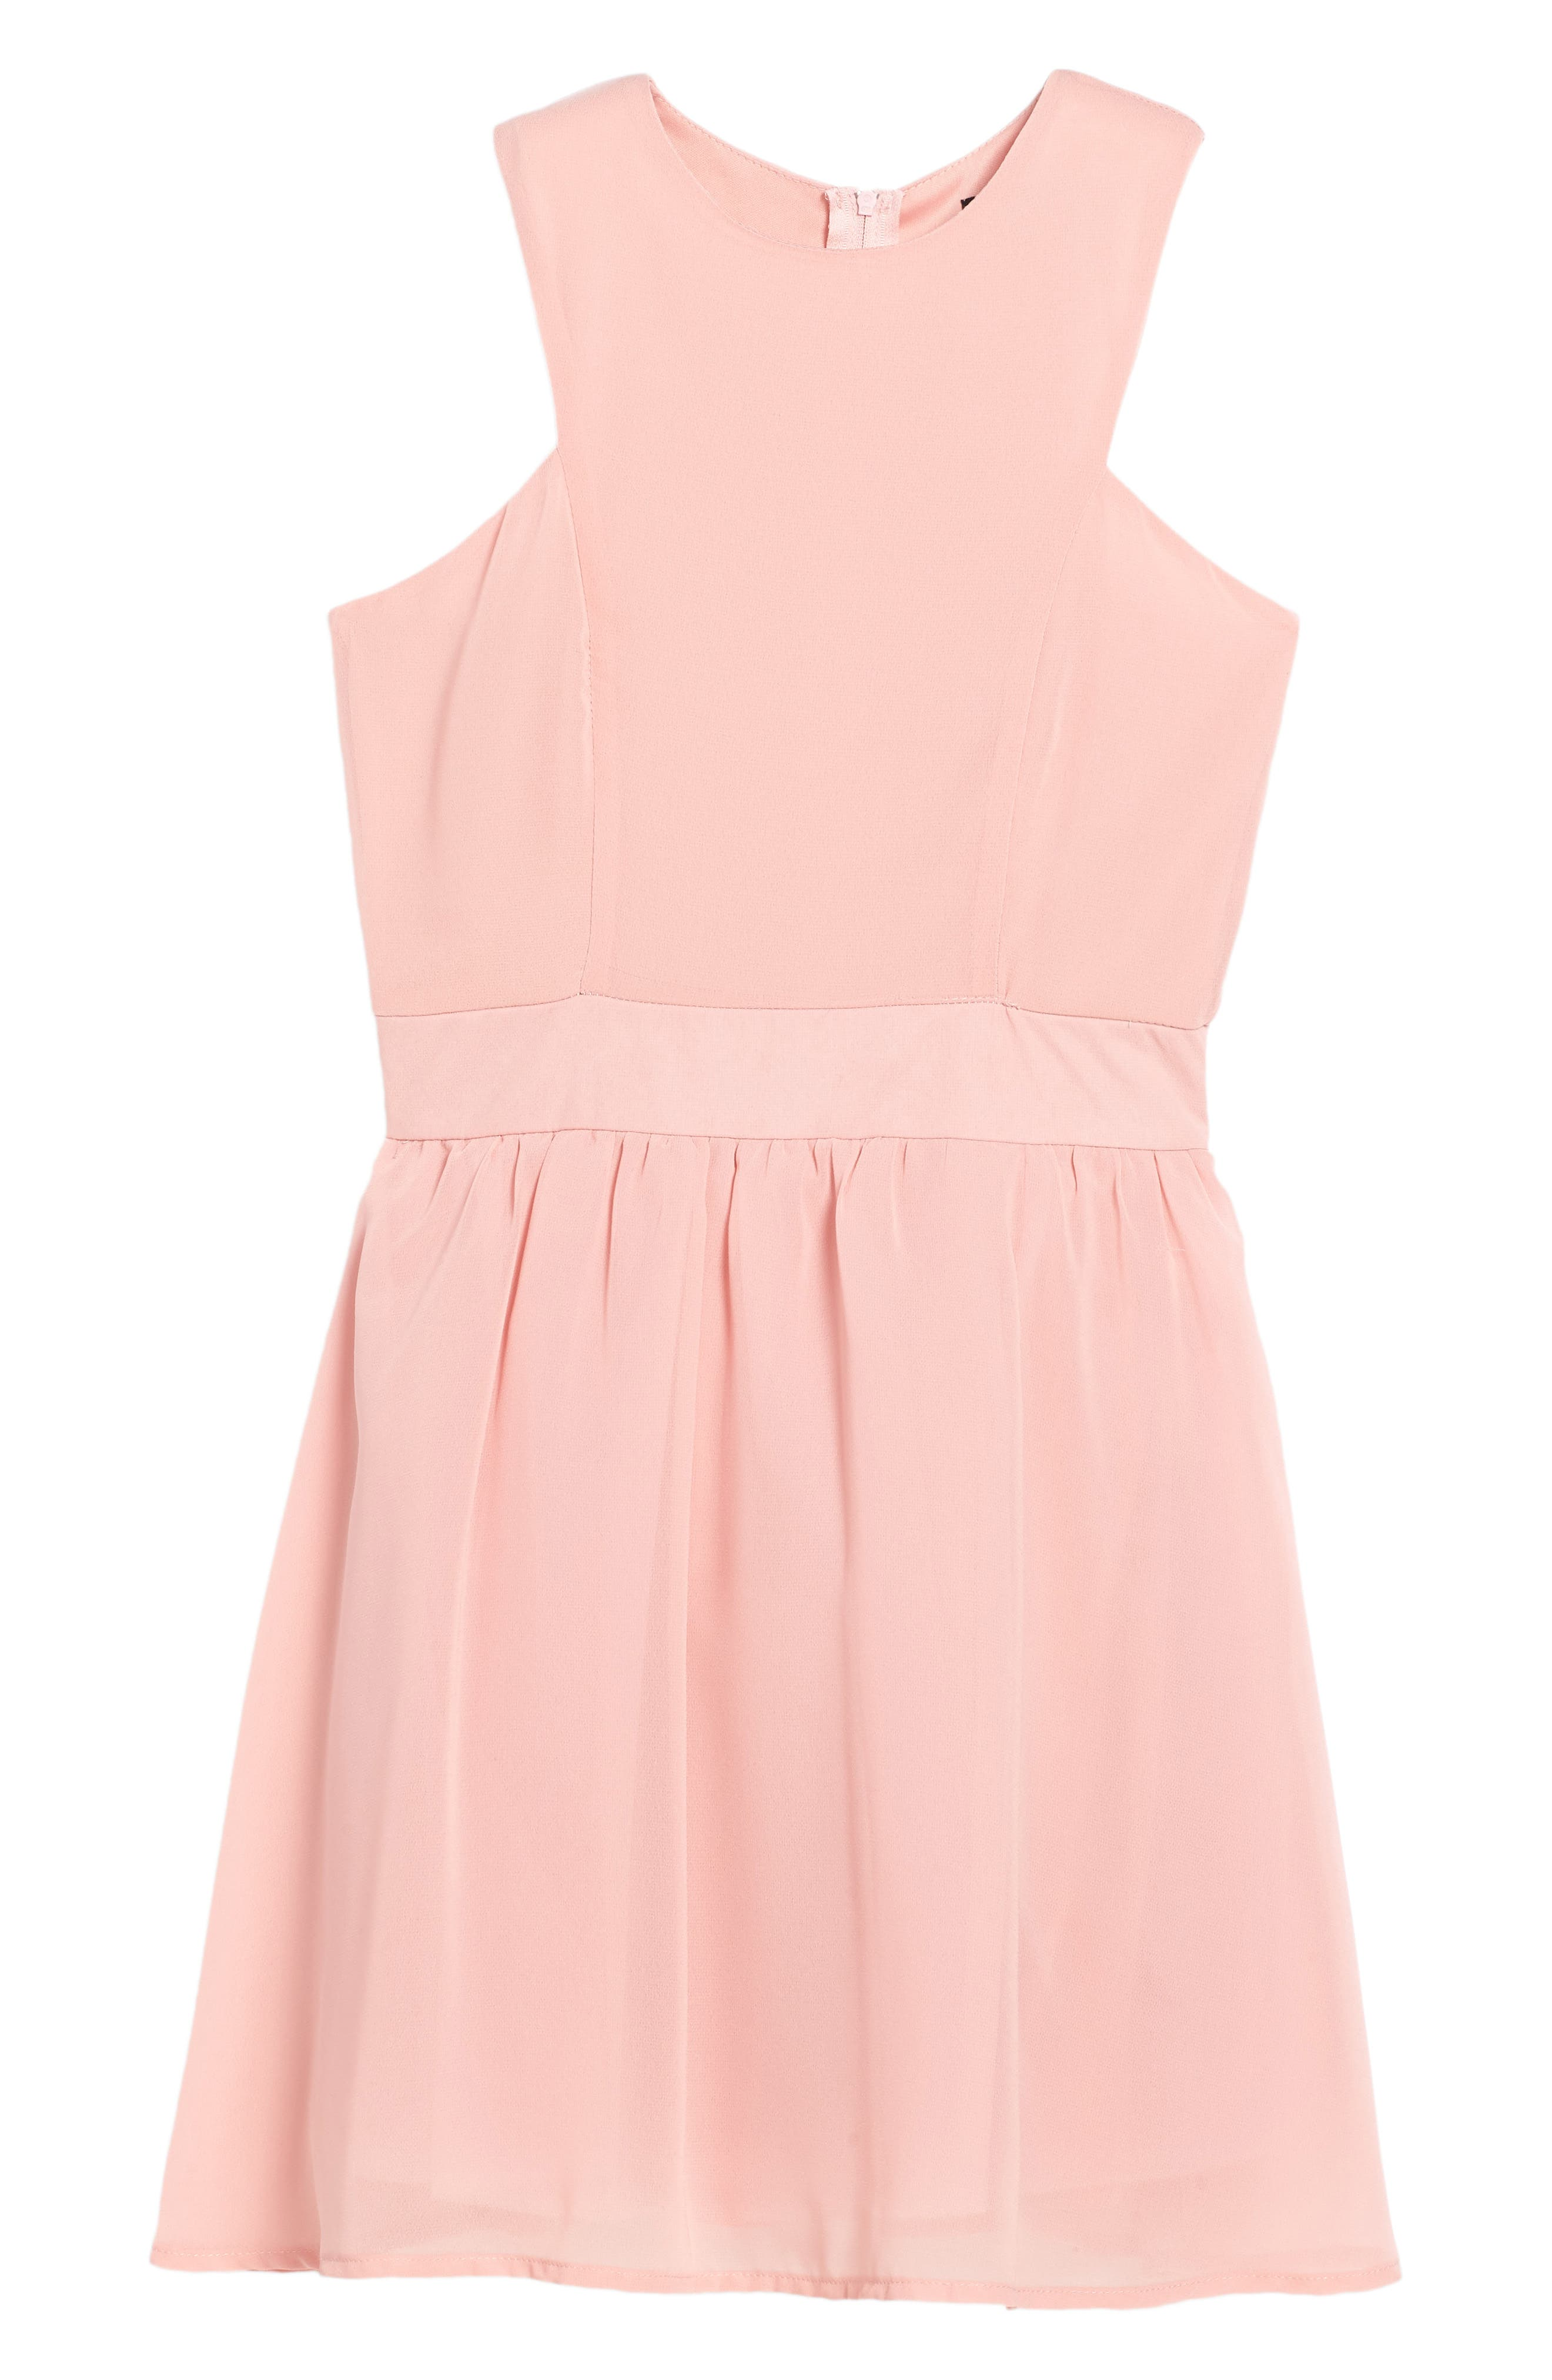 Alternate Image 1 Selected - Penelope Tree Camilla Sleeveless Dress (Big Girls)